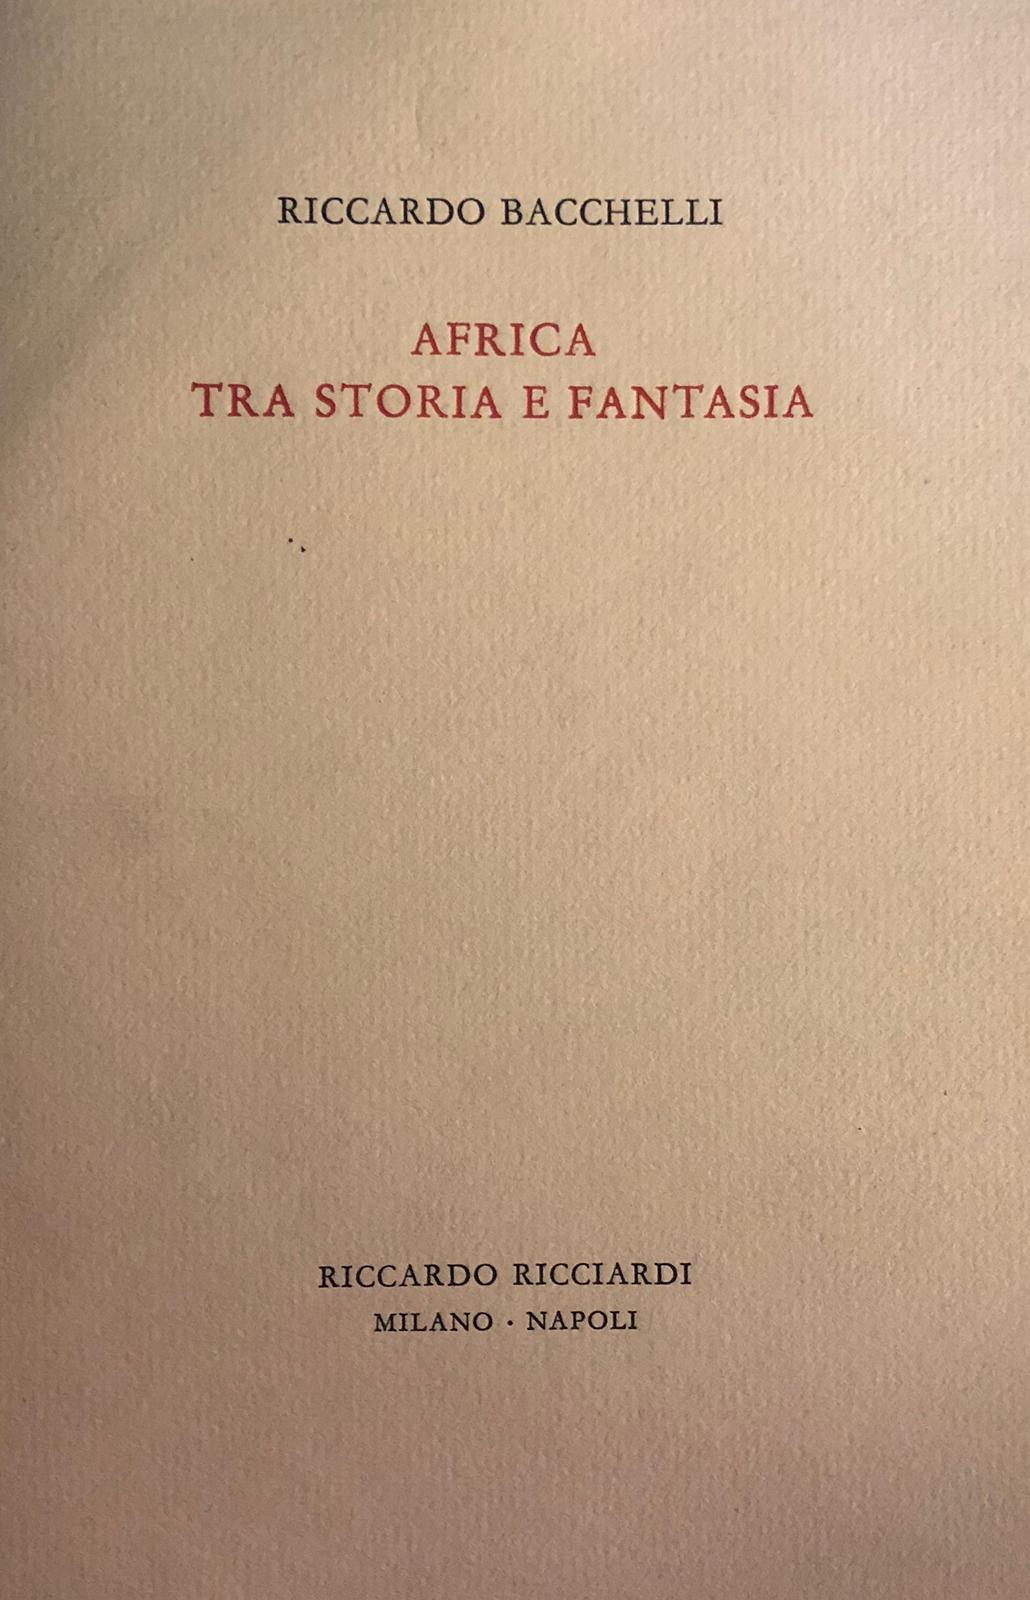 africa-tra-storia-e-fantasia